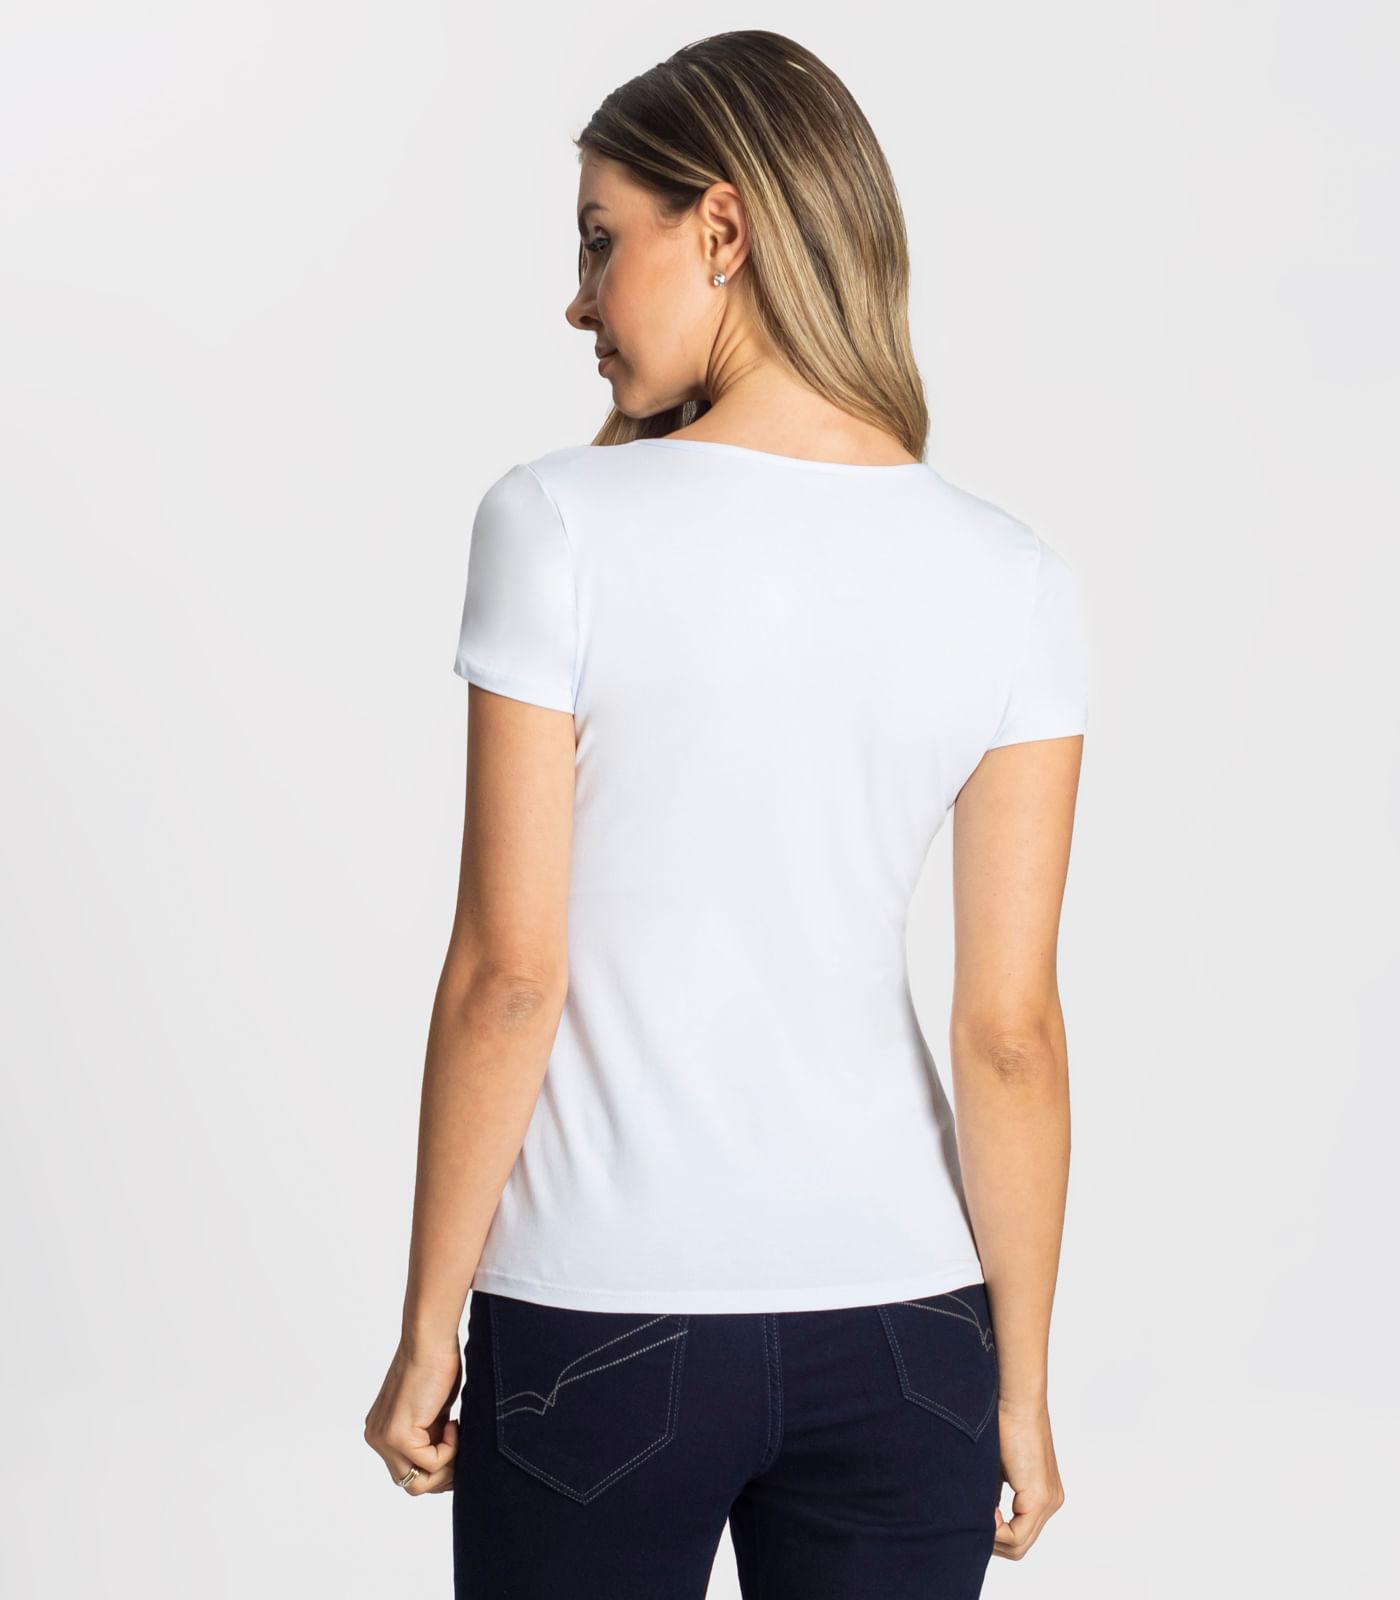 Blusa-Feminina-Basica-com-Aplique-Frontal-Rovitex-Branco